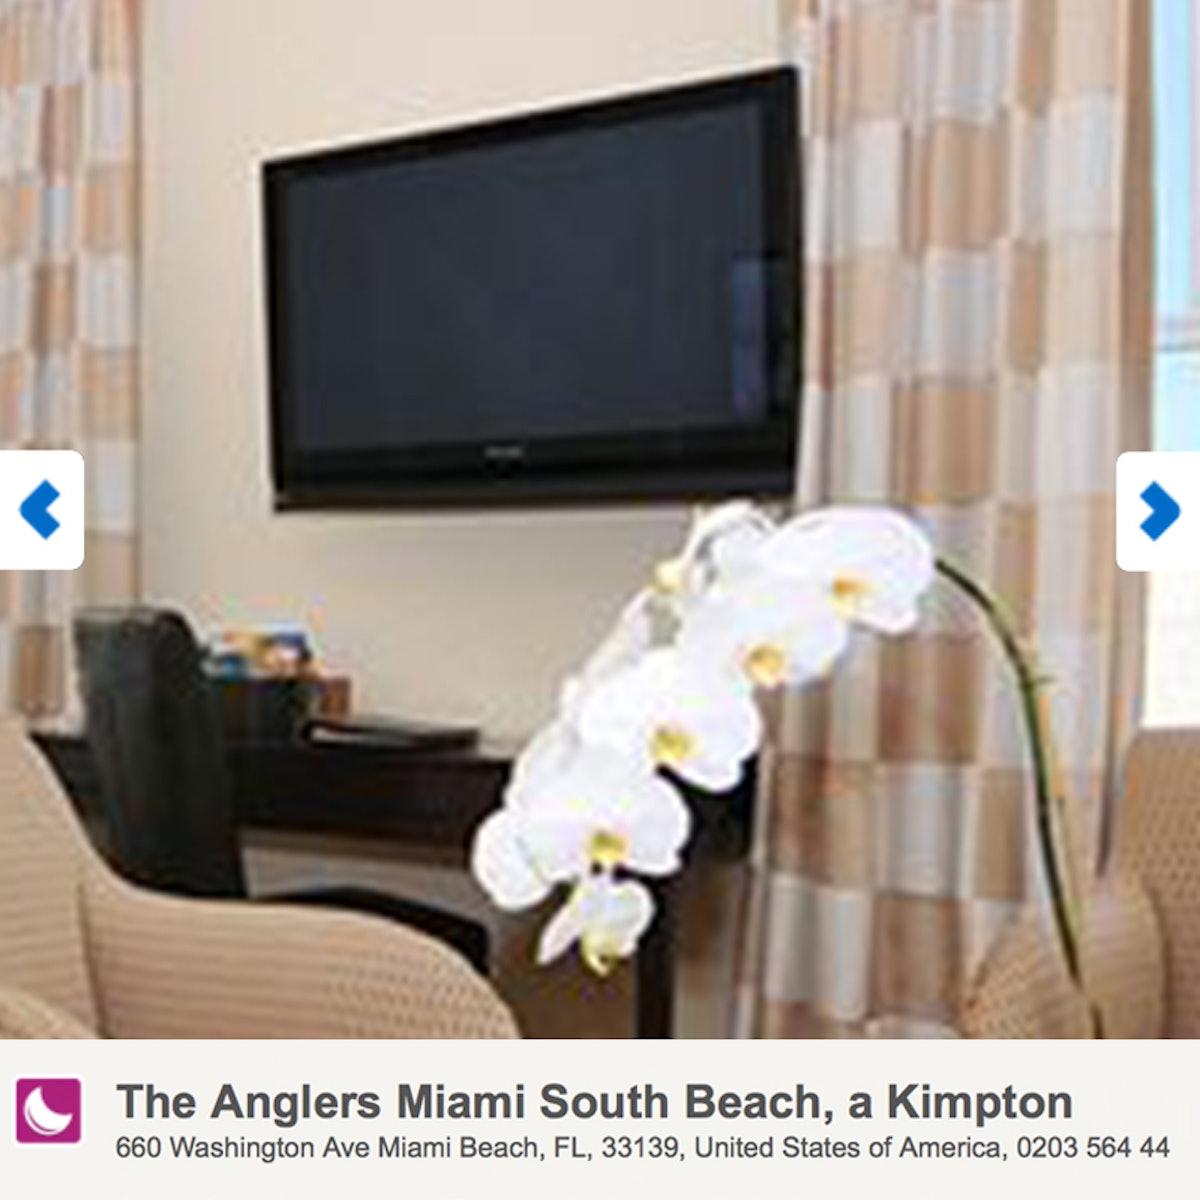 Amalia Ulman captures Miami hotels